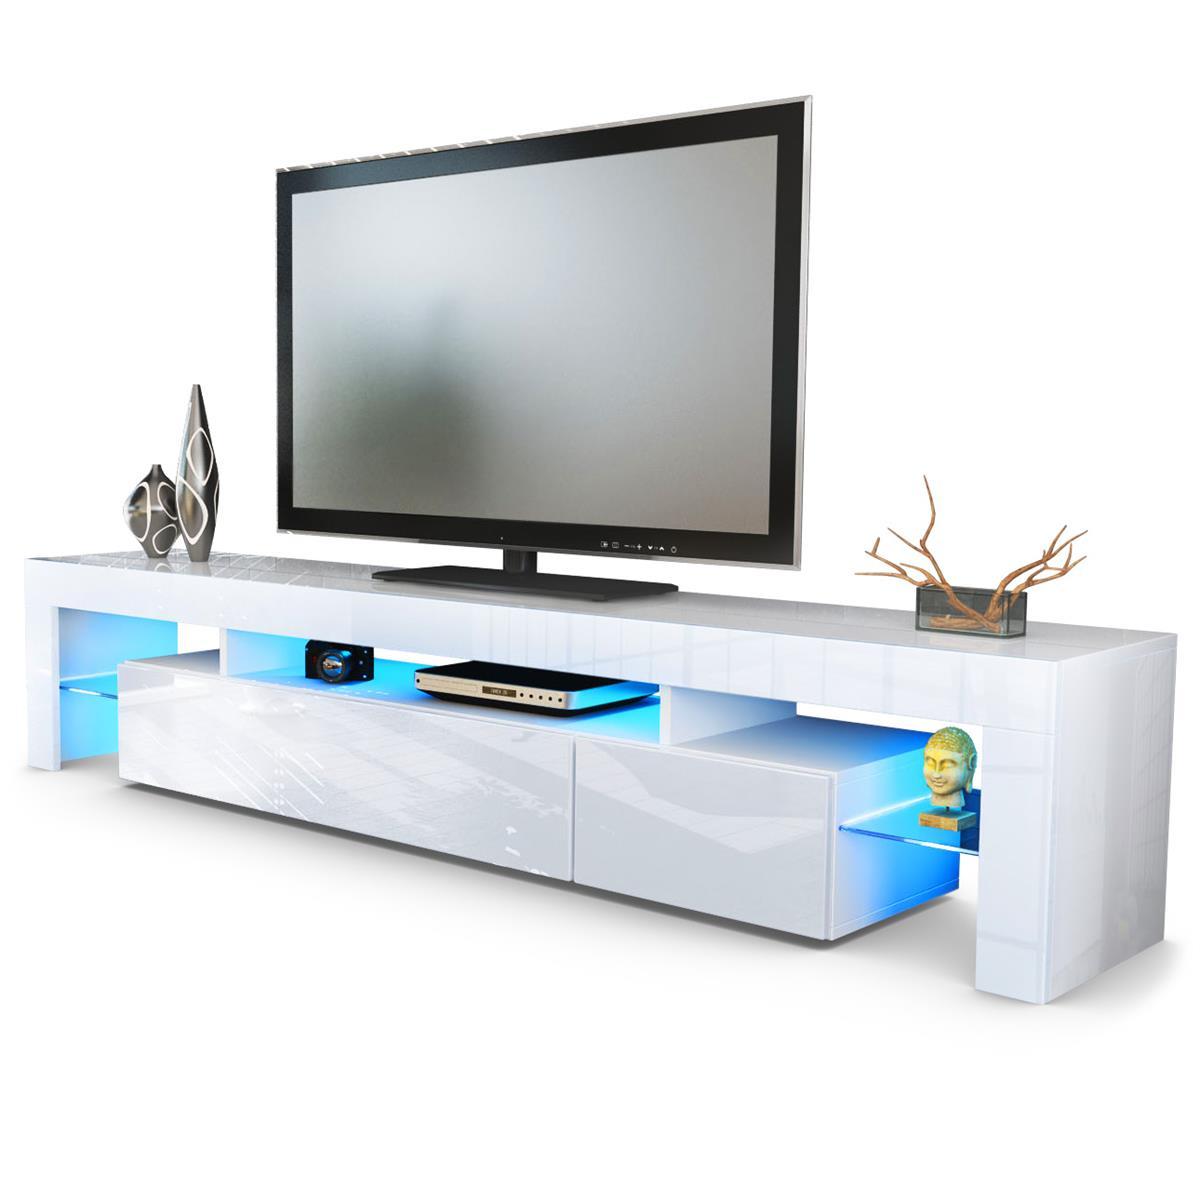 lowboard lima bestseller shop f r m bel und einrichtungen. Black Bedroom Furniture Sets. Home Design Ideas